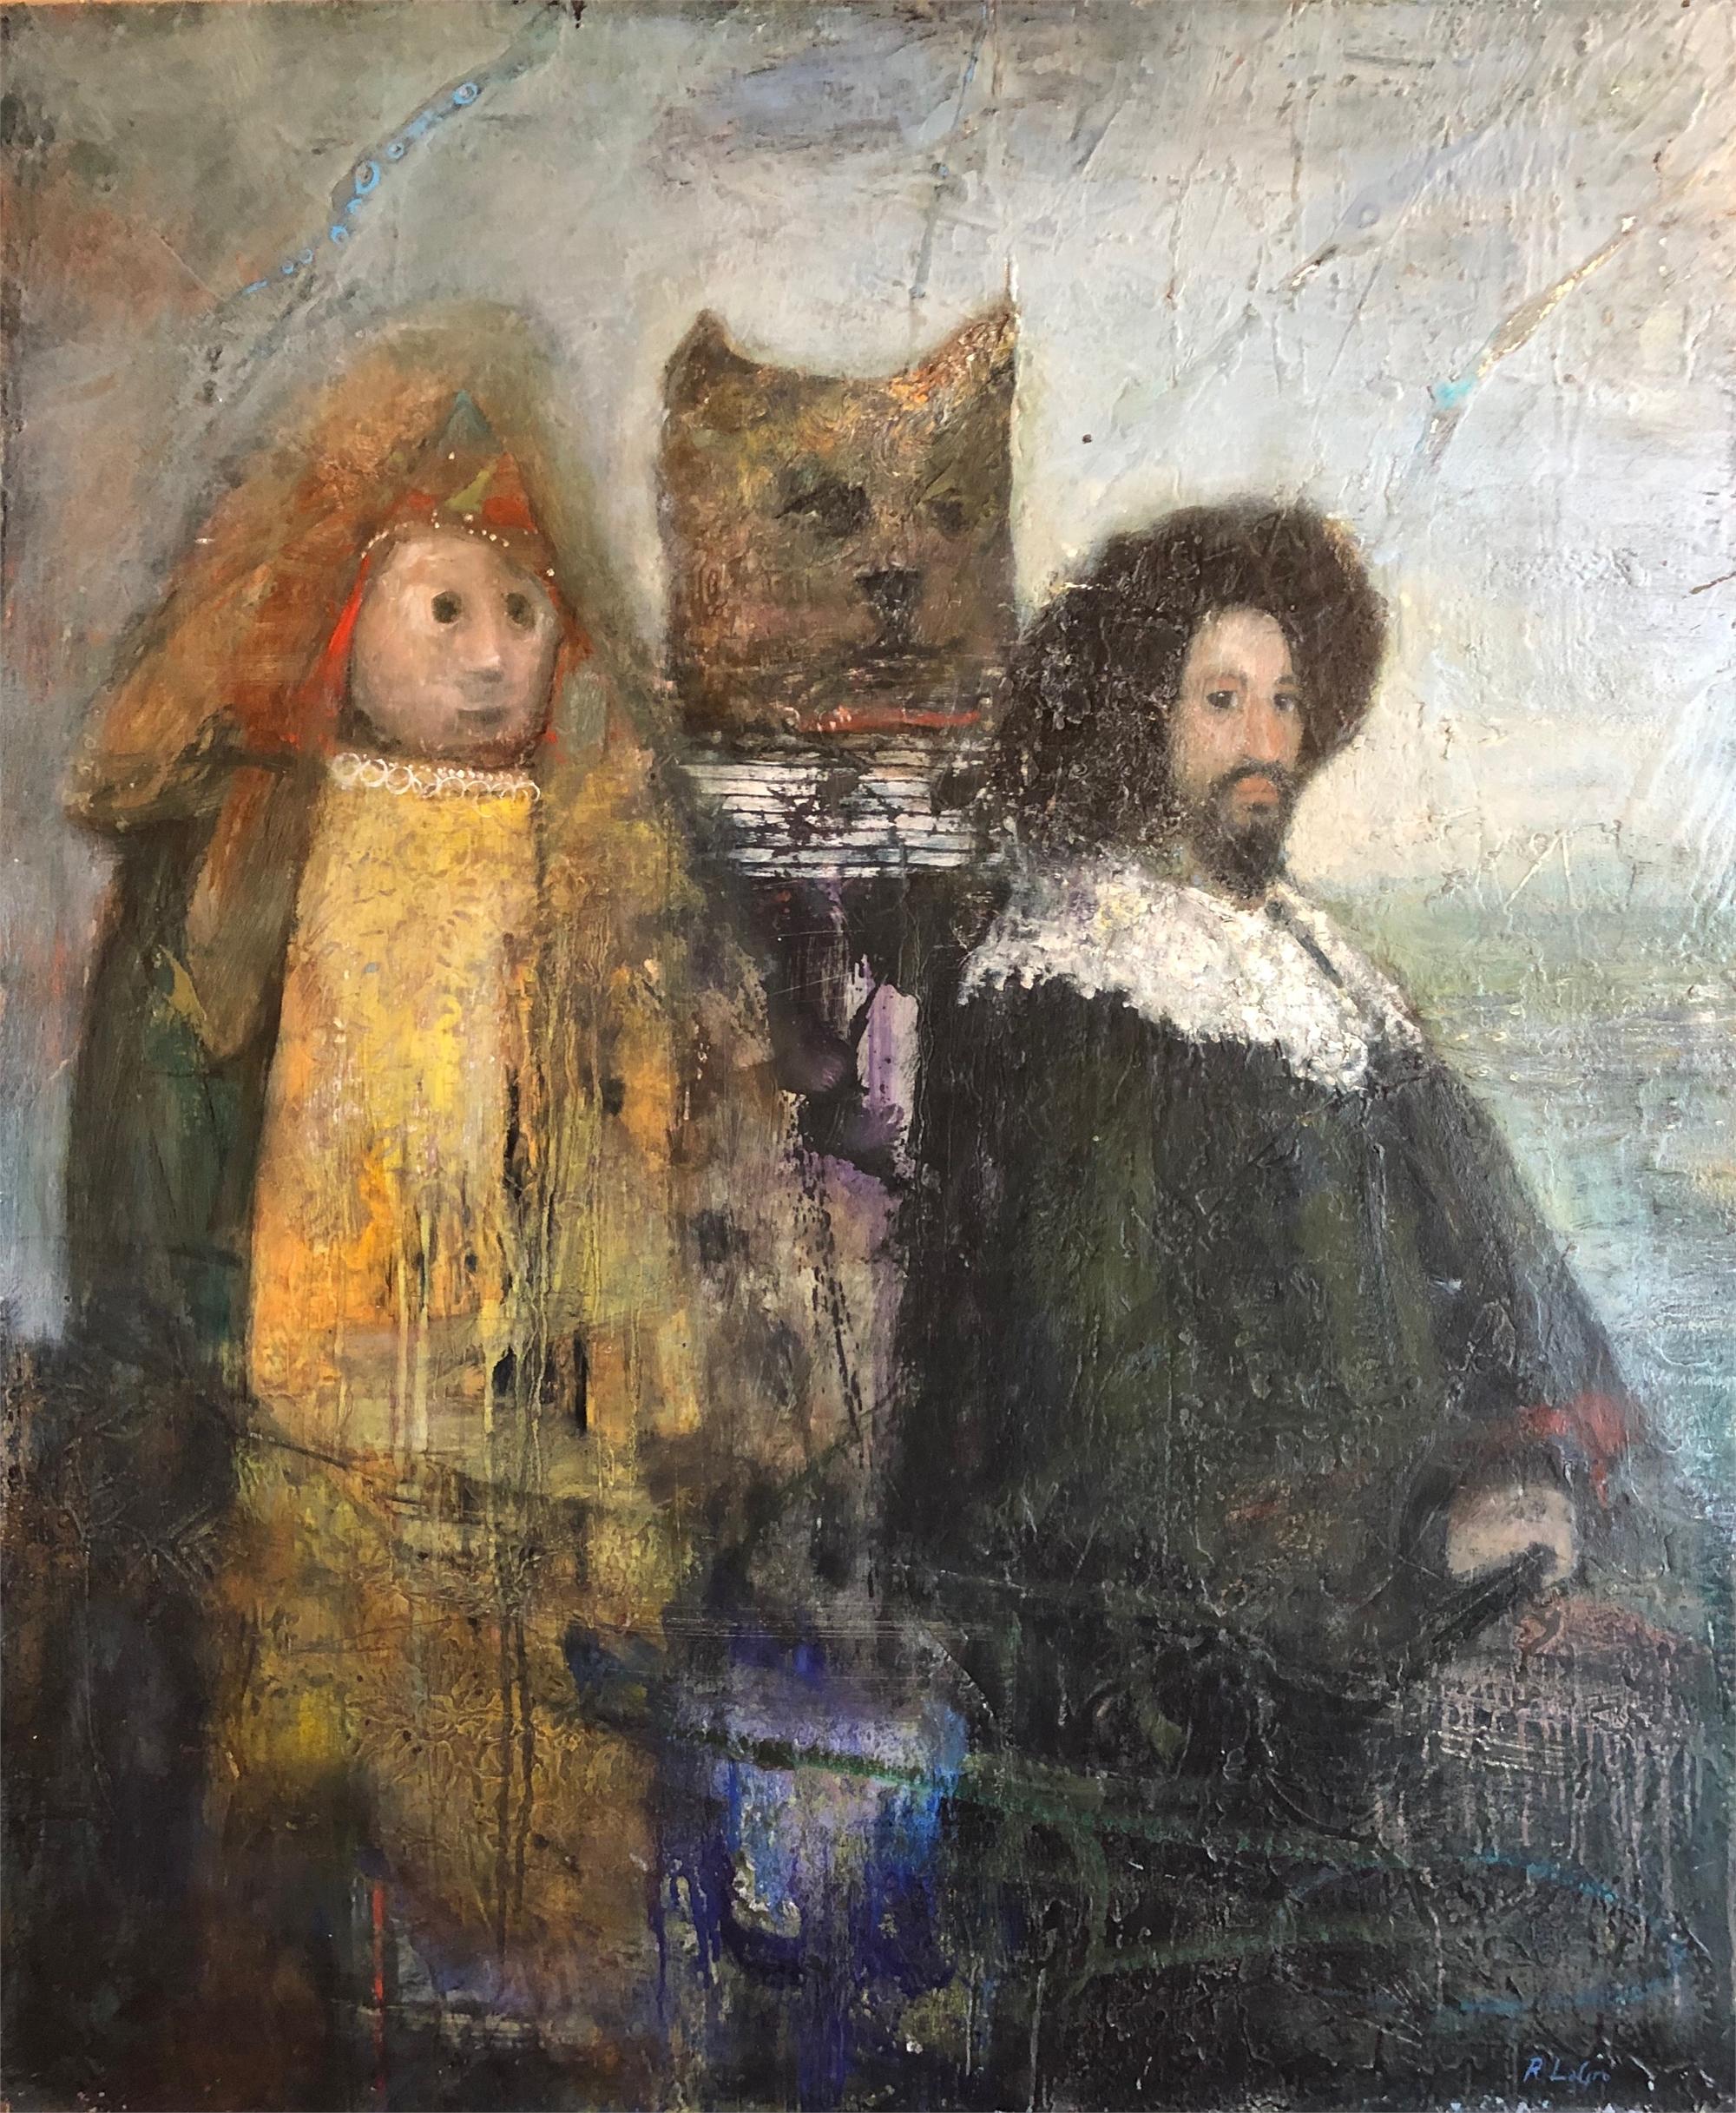 The Three Messengers by Randall LaGro